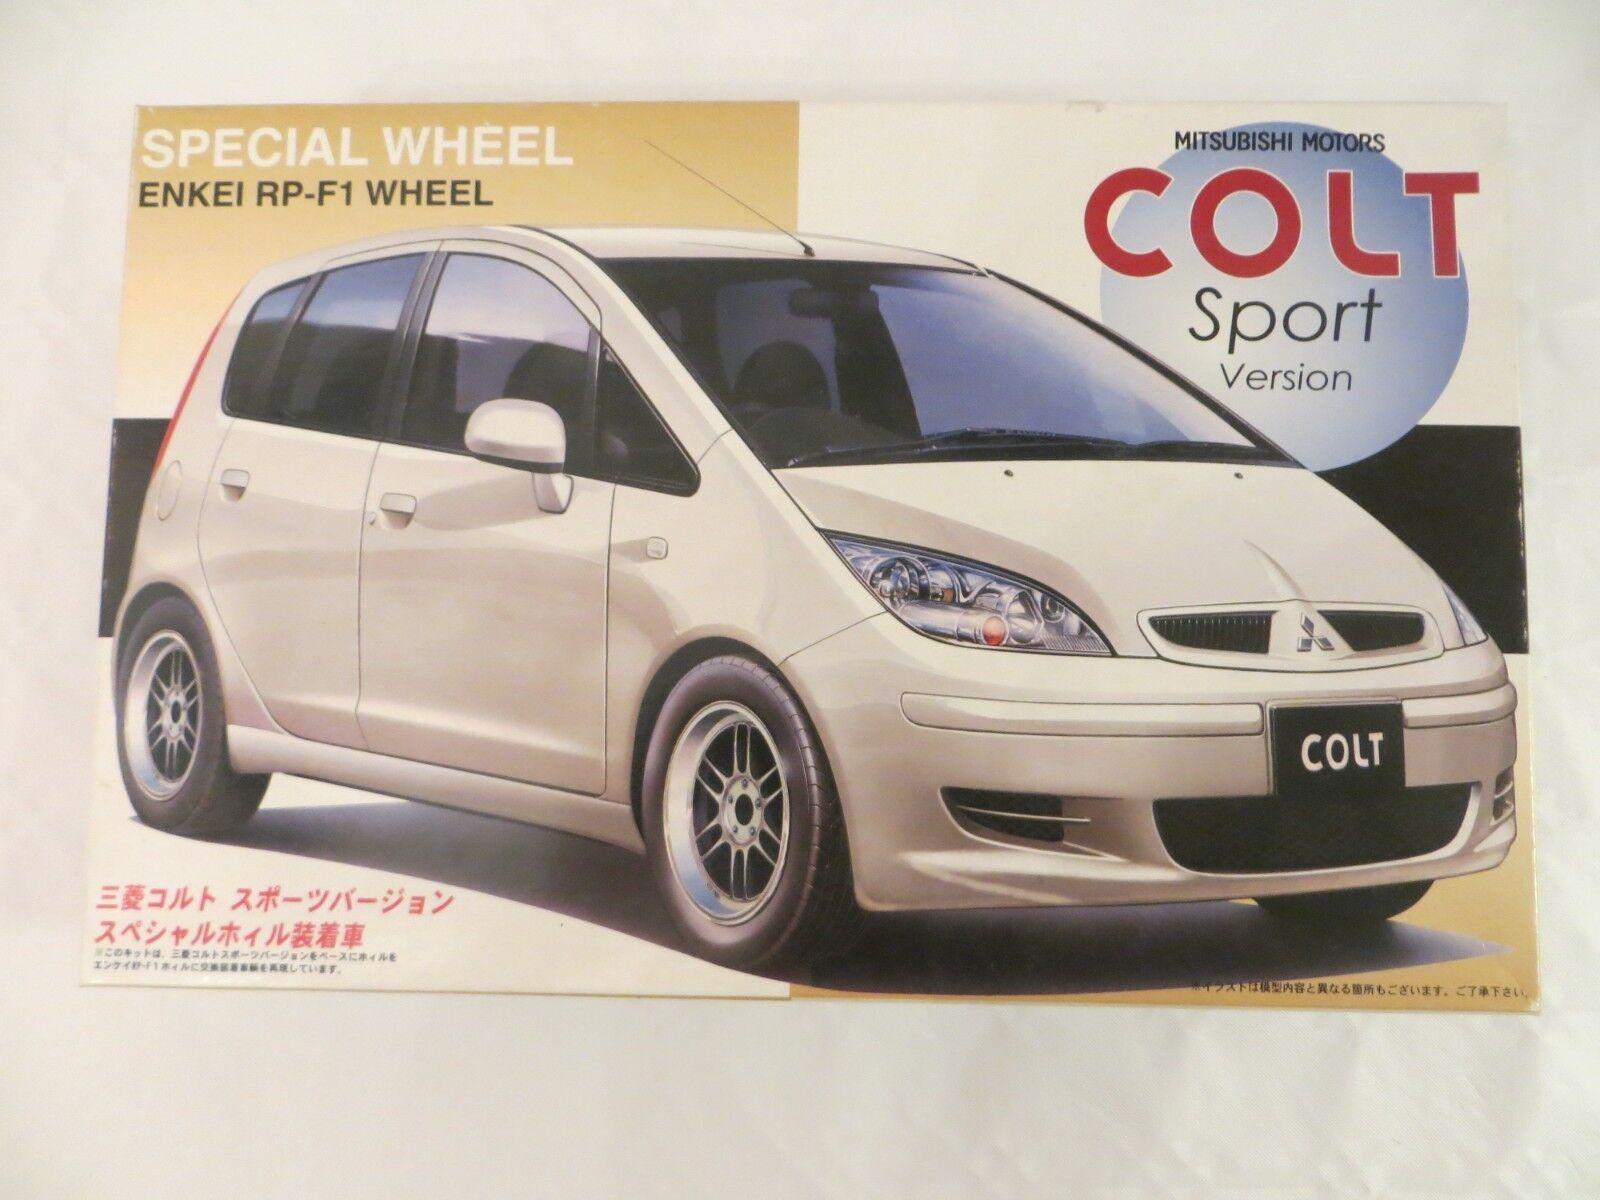 FUJIMI 1 24 Mitsubishi Colt Sport Version Special Wheel Model kit